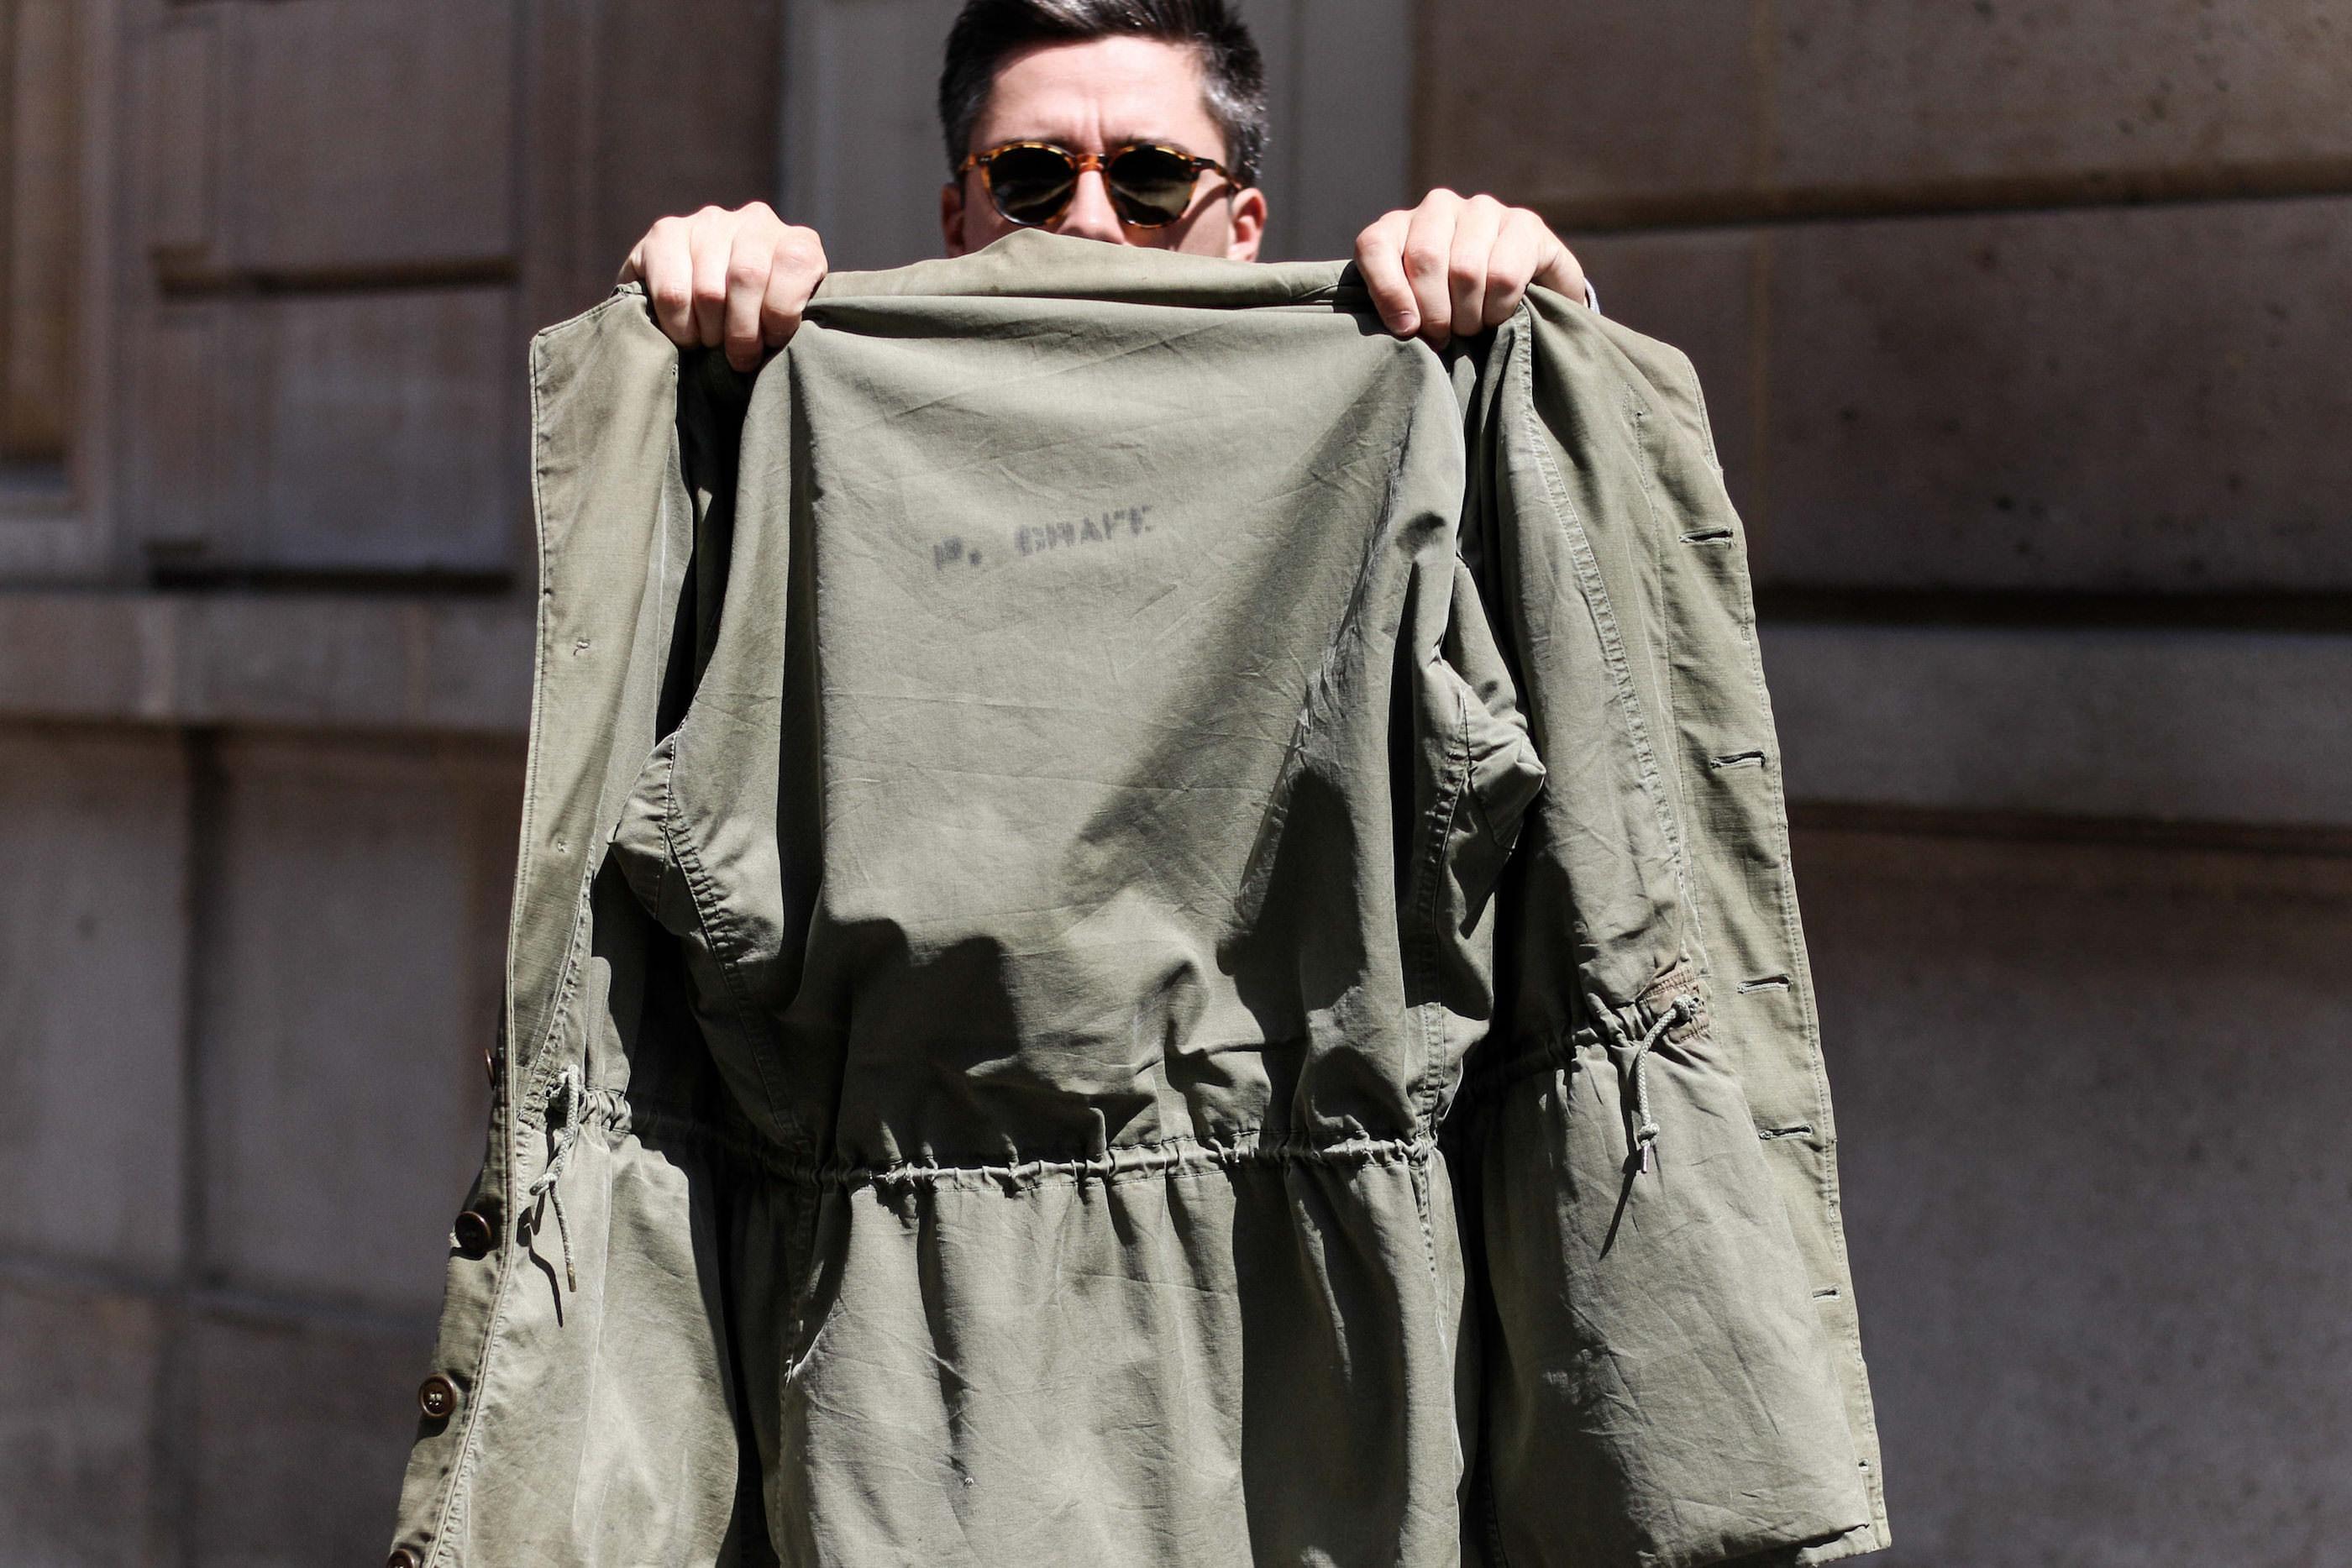 doublure veste m43 m-1943 field jacket